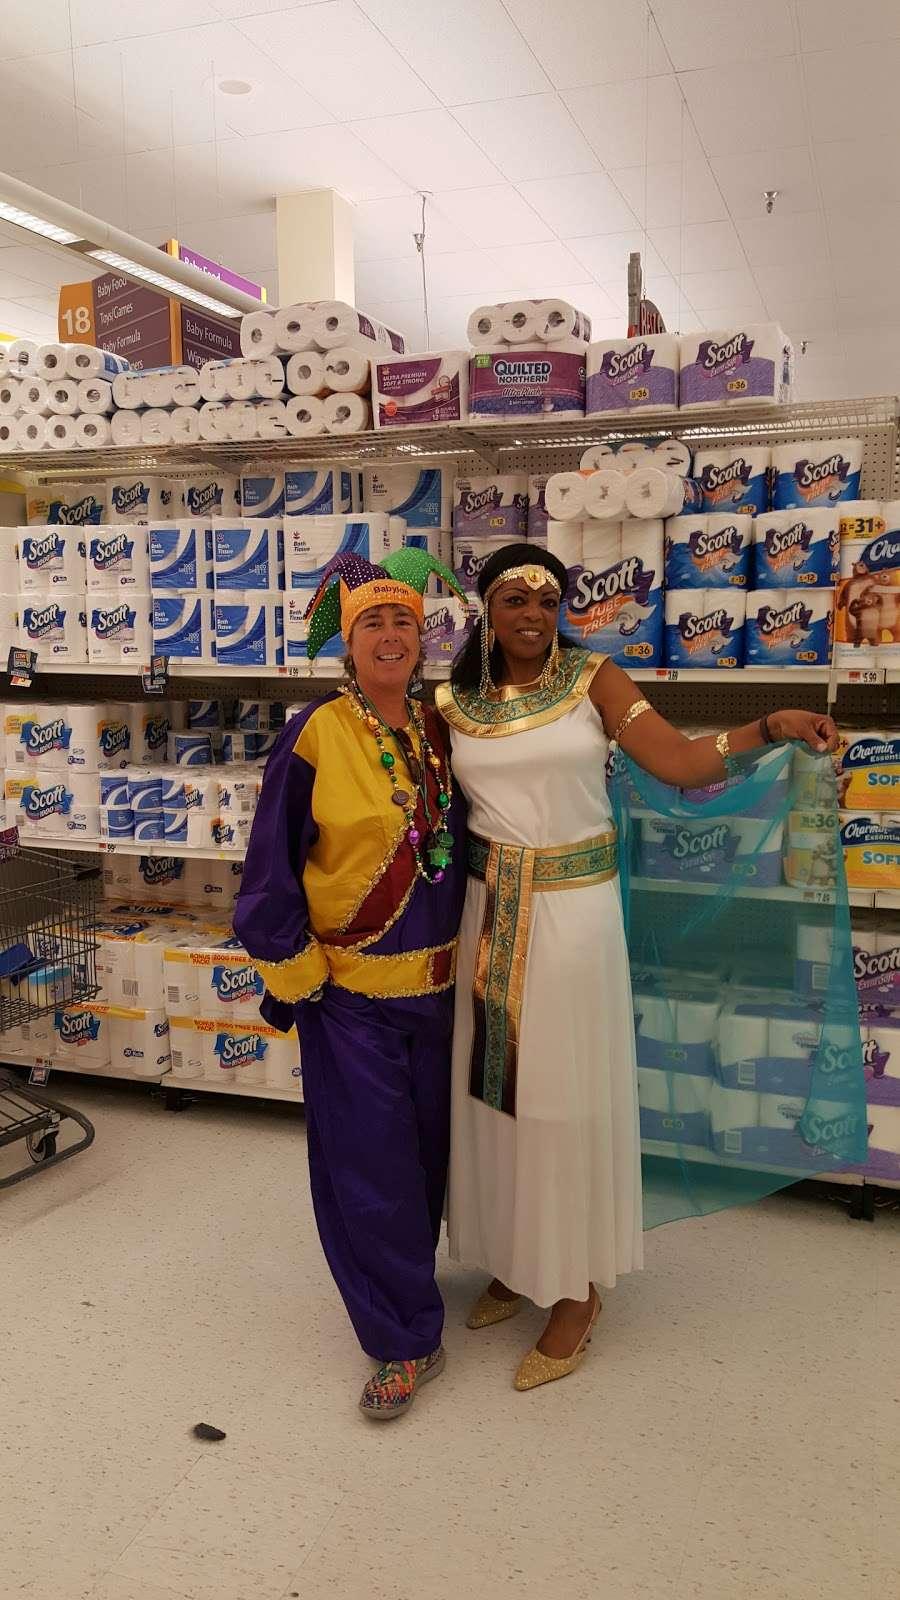 Spirit Halloween - clothing store  | Photo 1 of 5 | Address: 17766 Garland Groh Blvd, Hagerstown, MD 21740, USA | Phone: (866) 586-0155